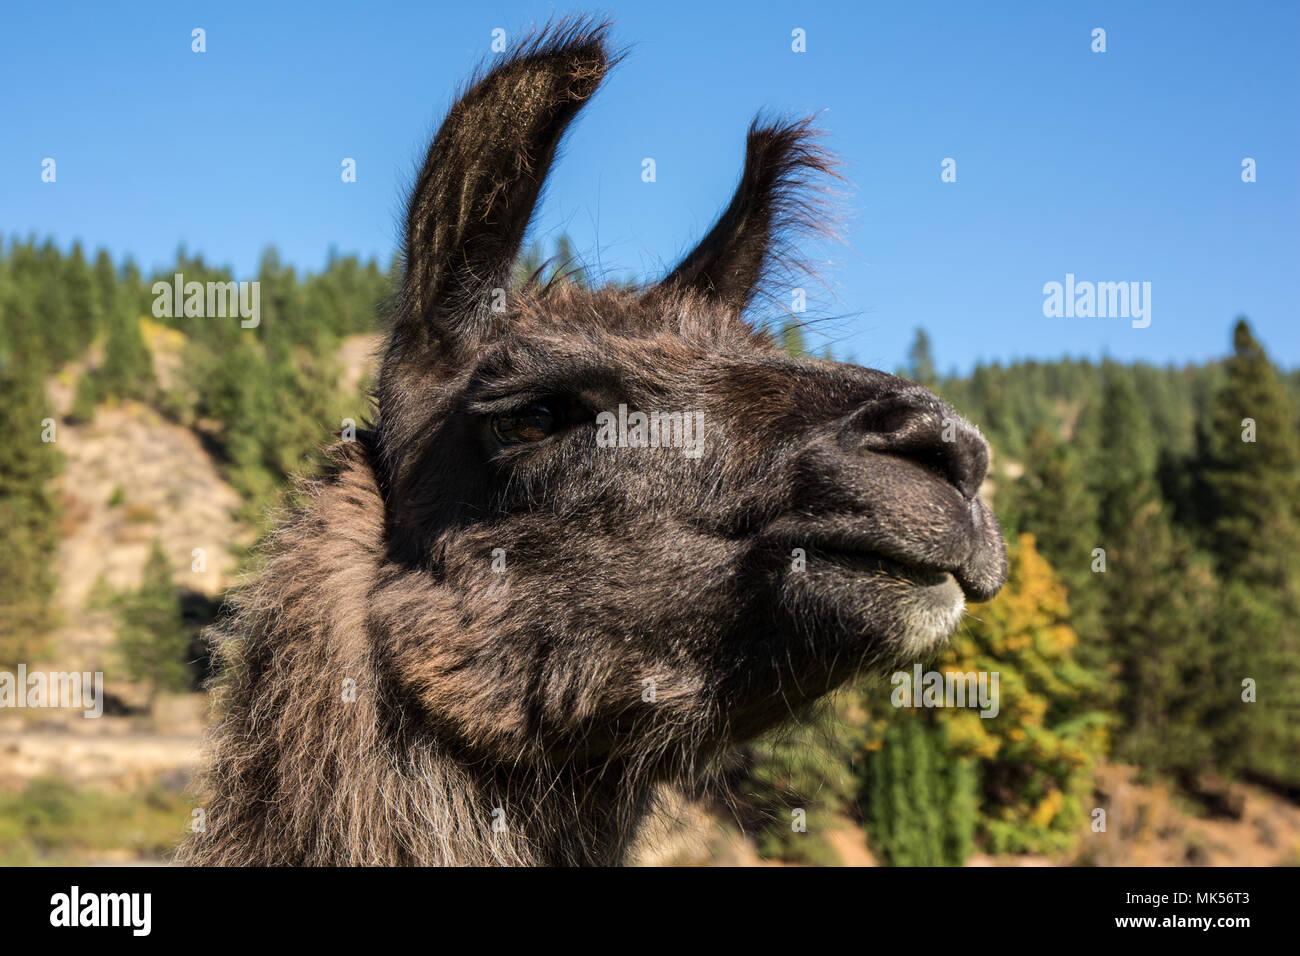 Leavenworth, Washington, USA. LLama portrait. (PR) - Stock Image